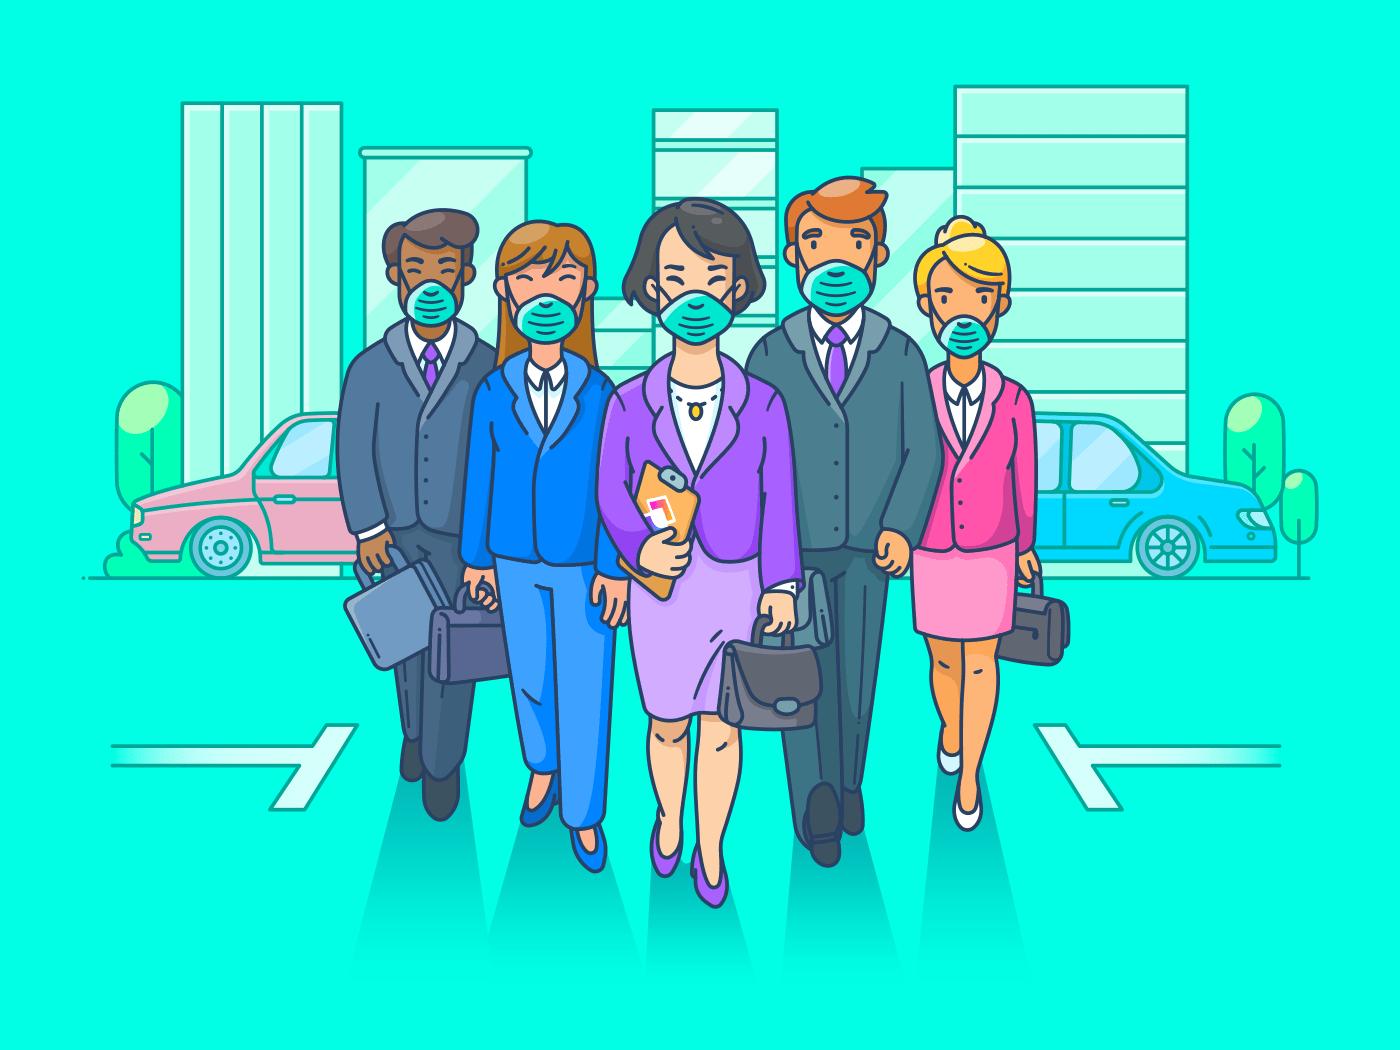 Team returning to work